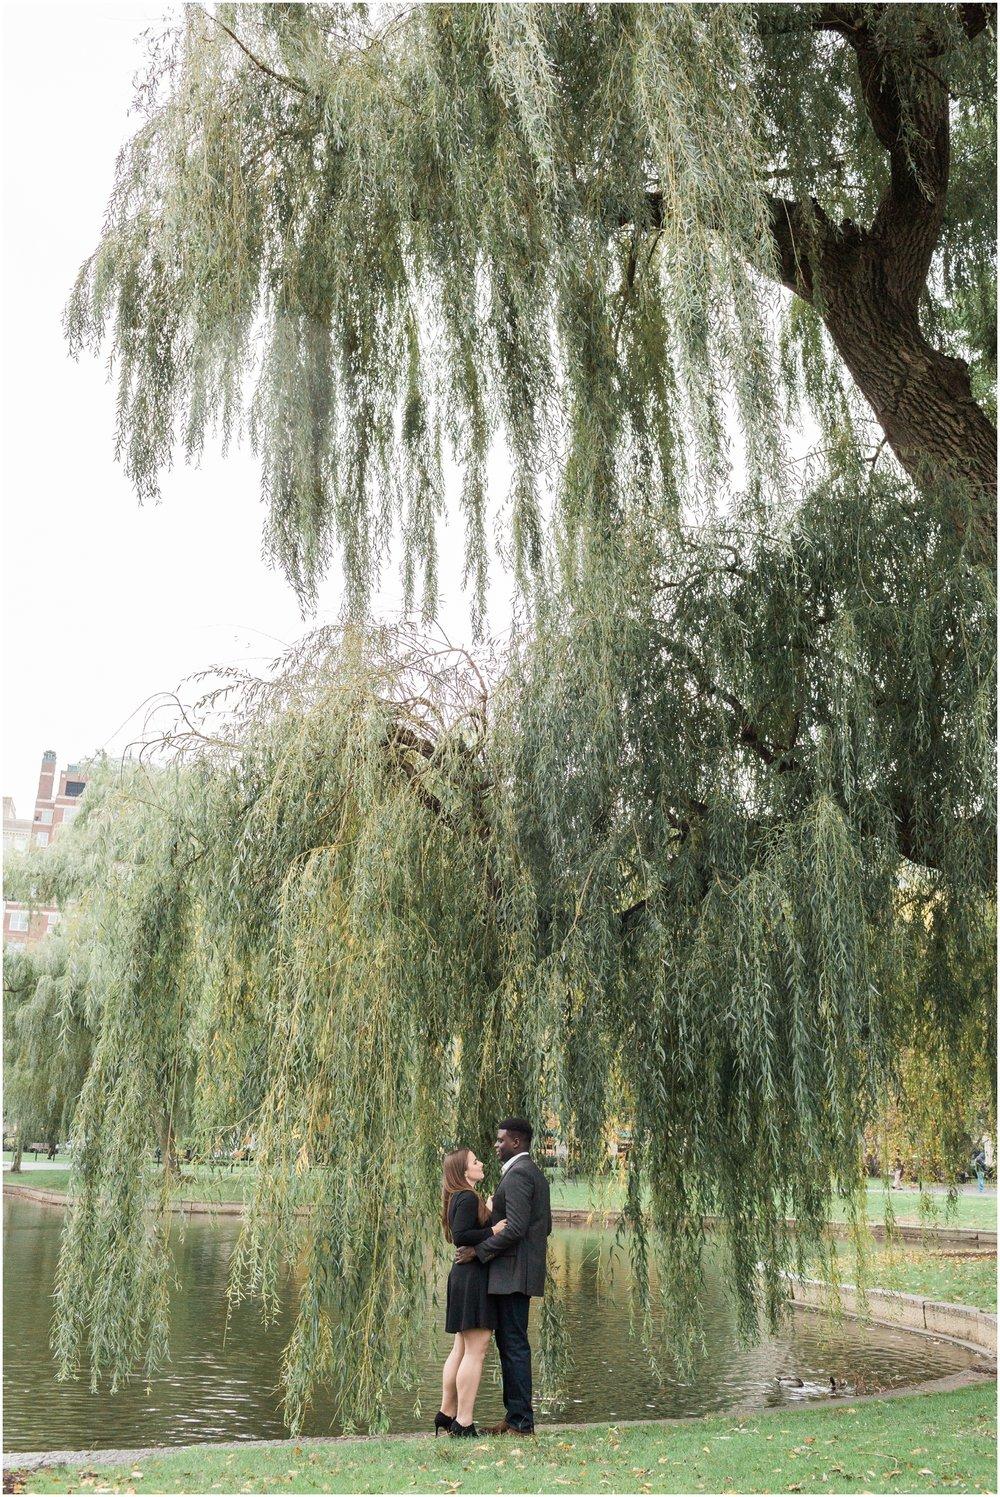 Boston Public Gardens Engagement Session // Boston Engagement Photographer